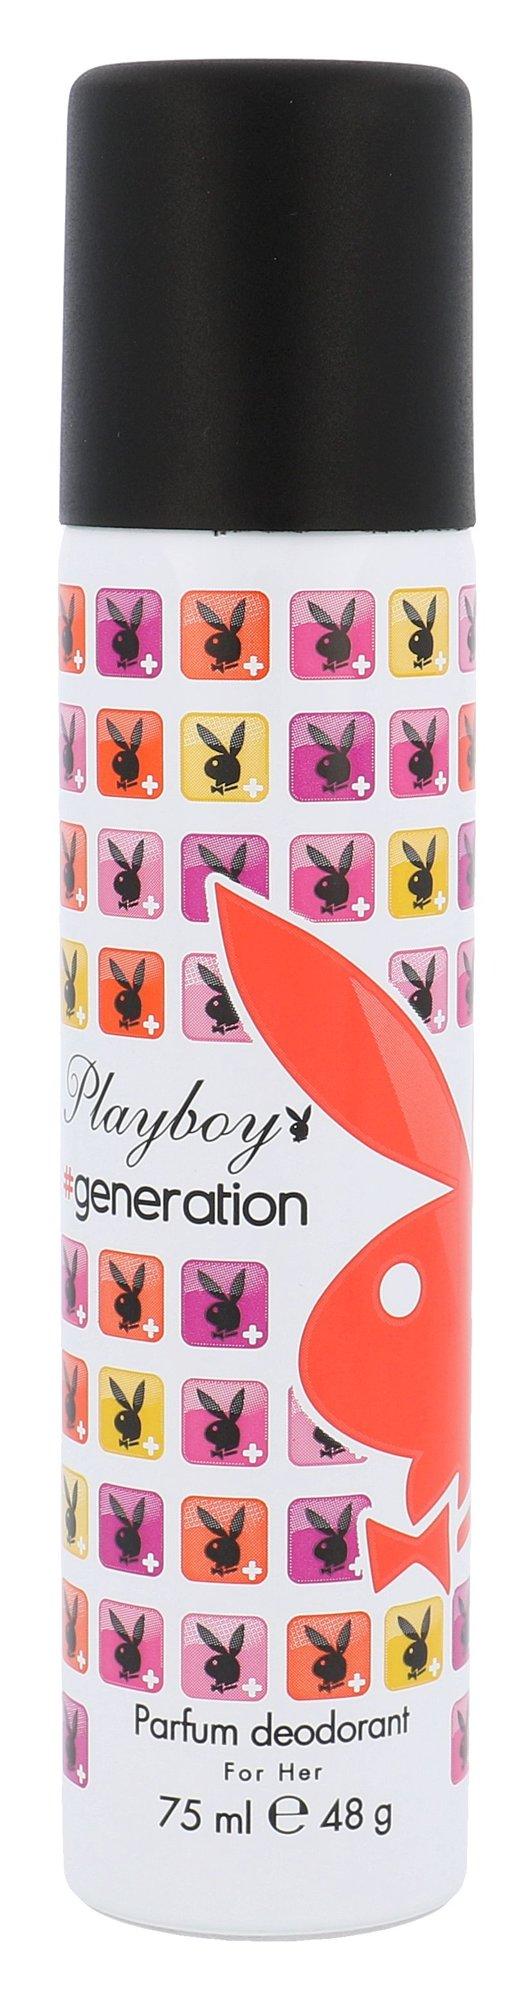 Playboy Generation For Her Deodorant 75ml